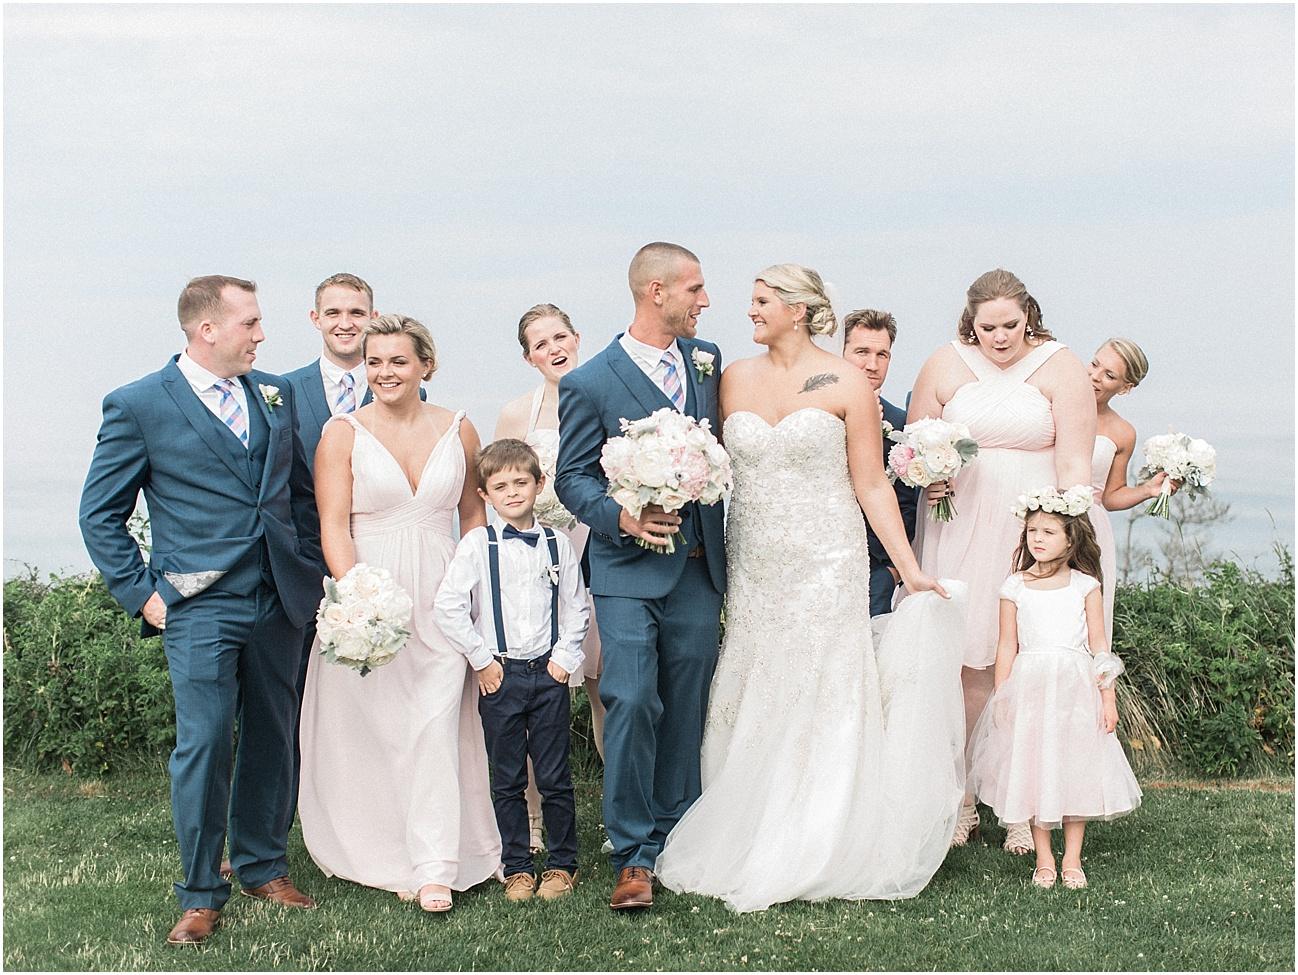 kati_bryan_maskell_white_cliffs_country_club_cape_cod_boston_wedding_photographer_meredith_jane_photography_photo_0480.jpg